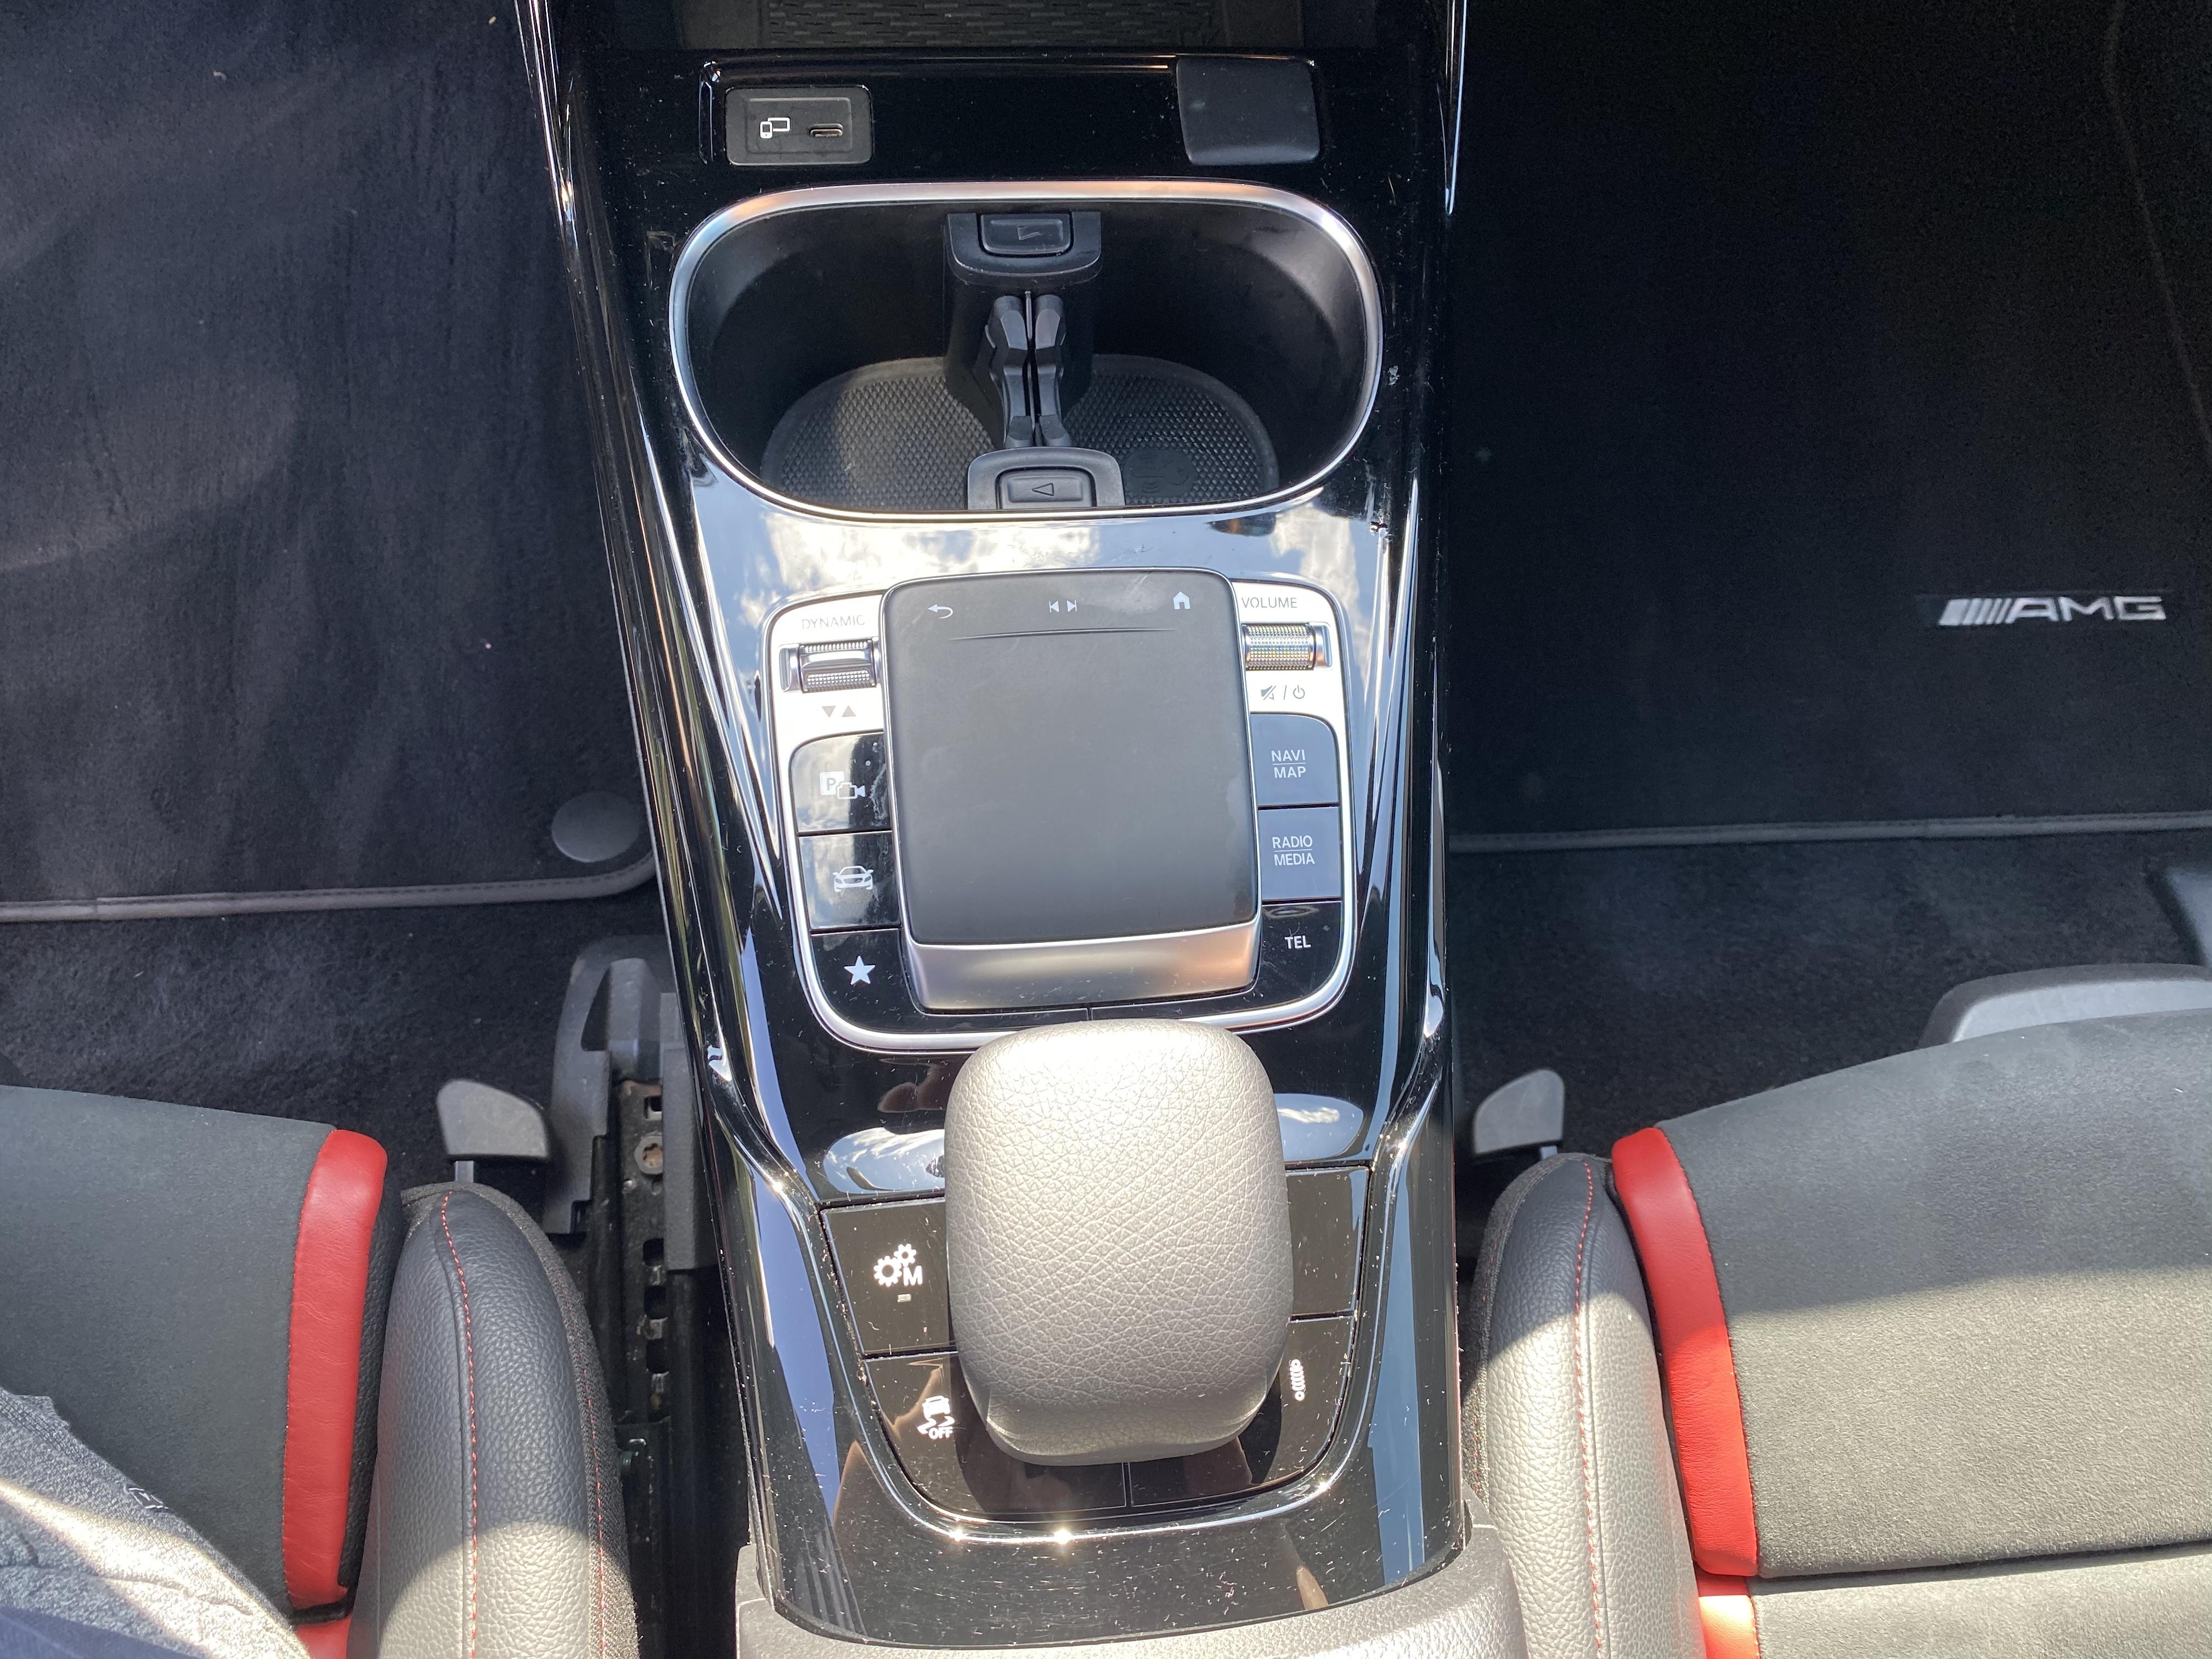 Mercedes A35 AMG  2019 4MATIC Performance-stoelen